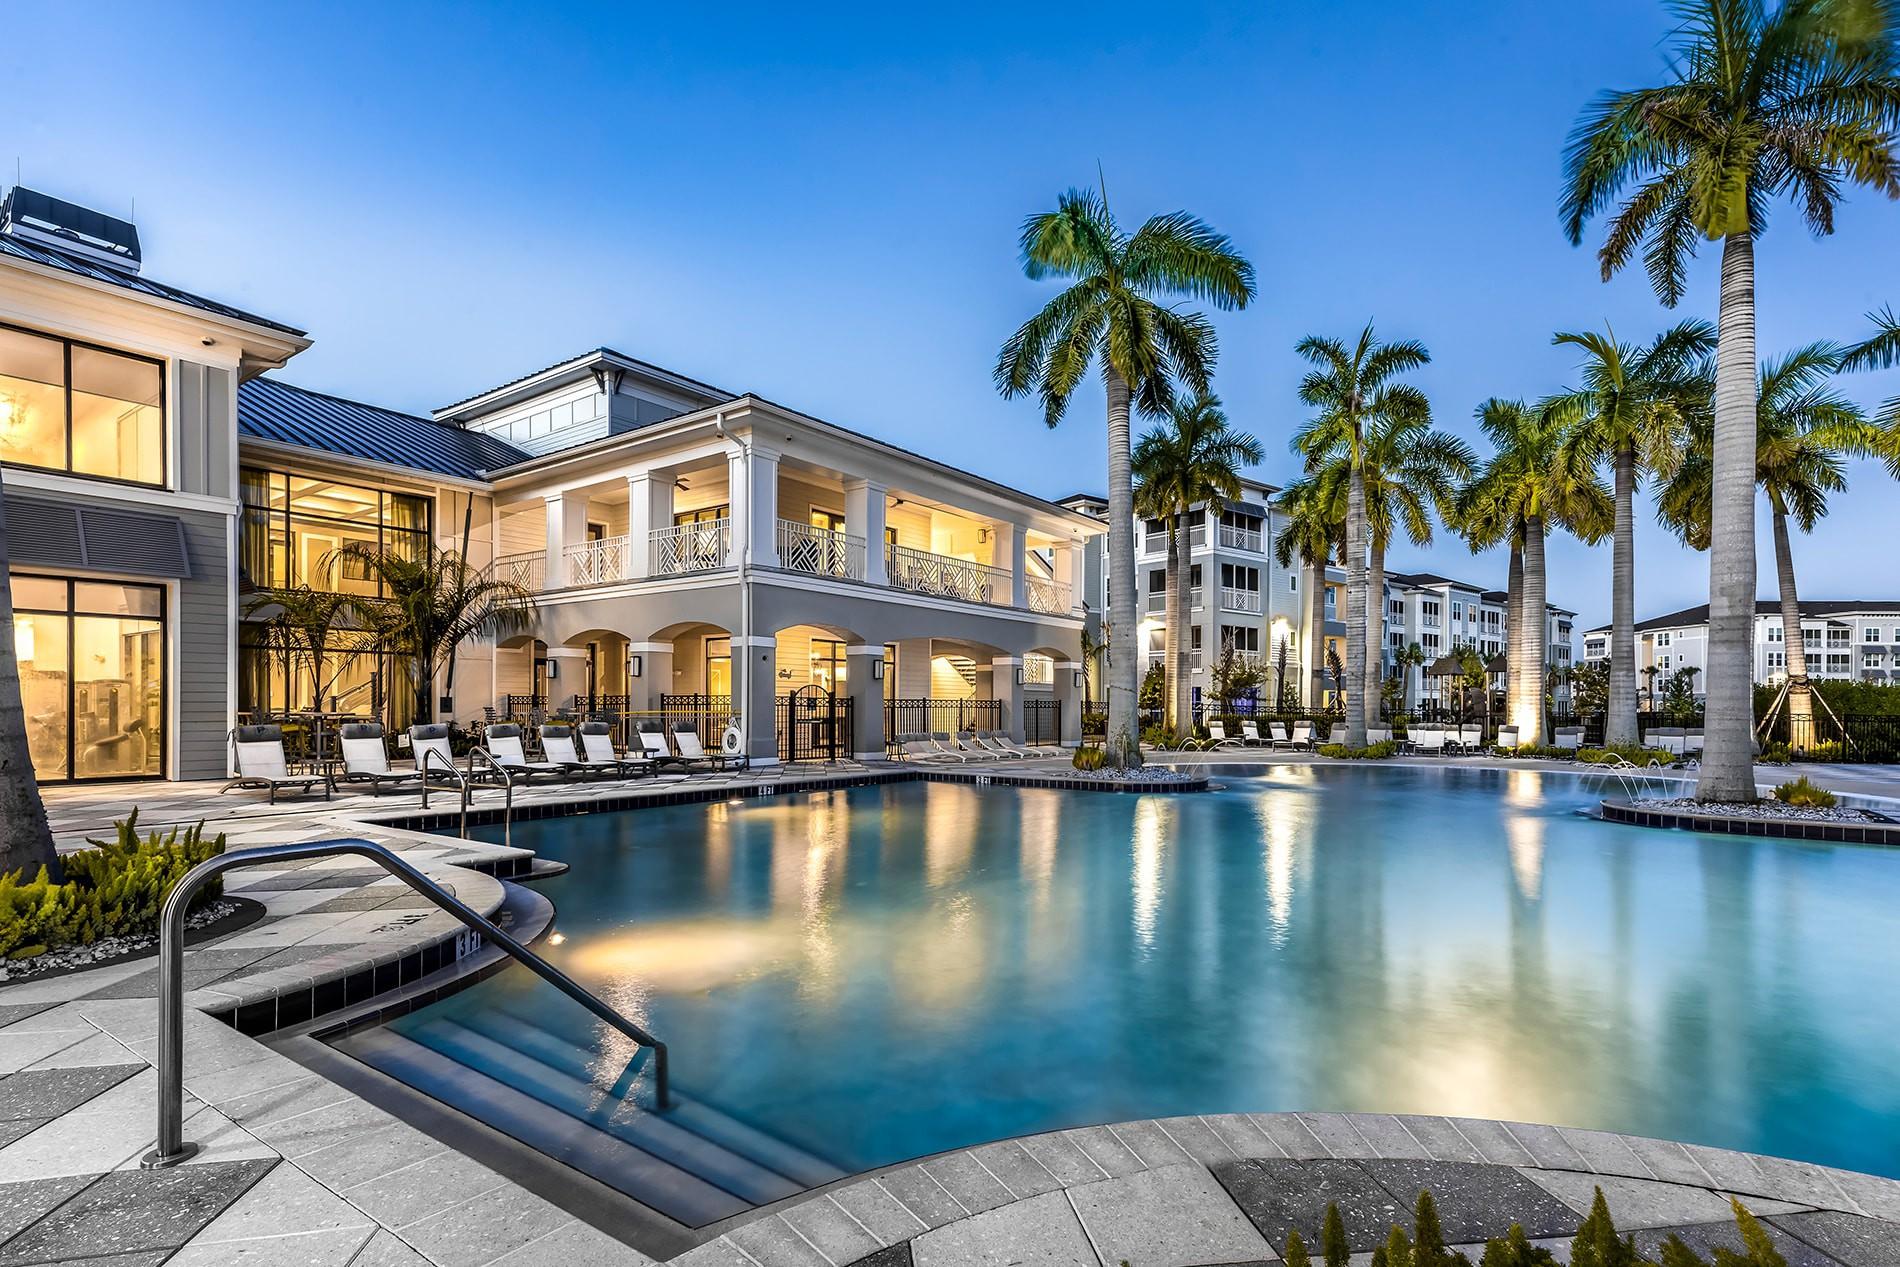 Apartments Near Eckerd Peridot Palms for Eckerd College Students in Saint Petersburg, FL